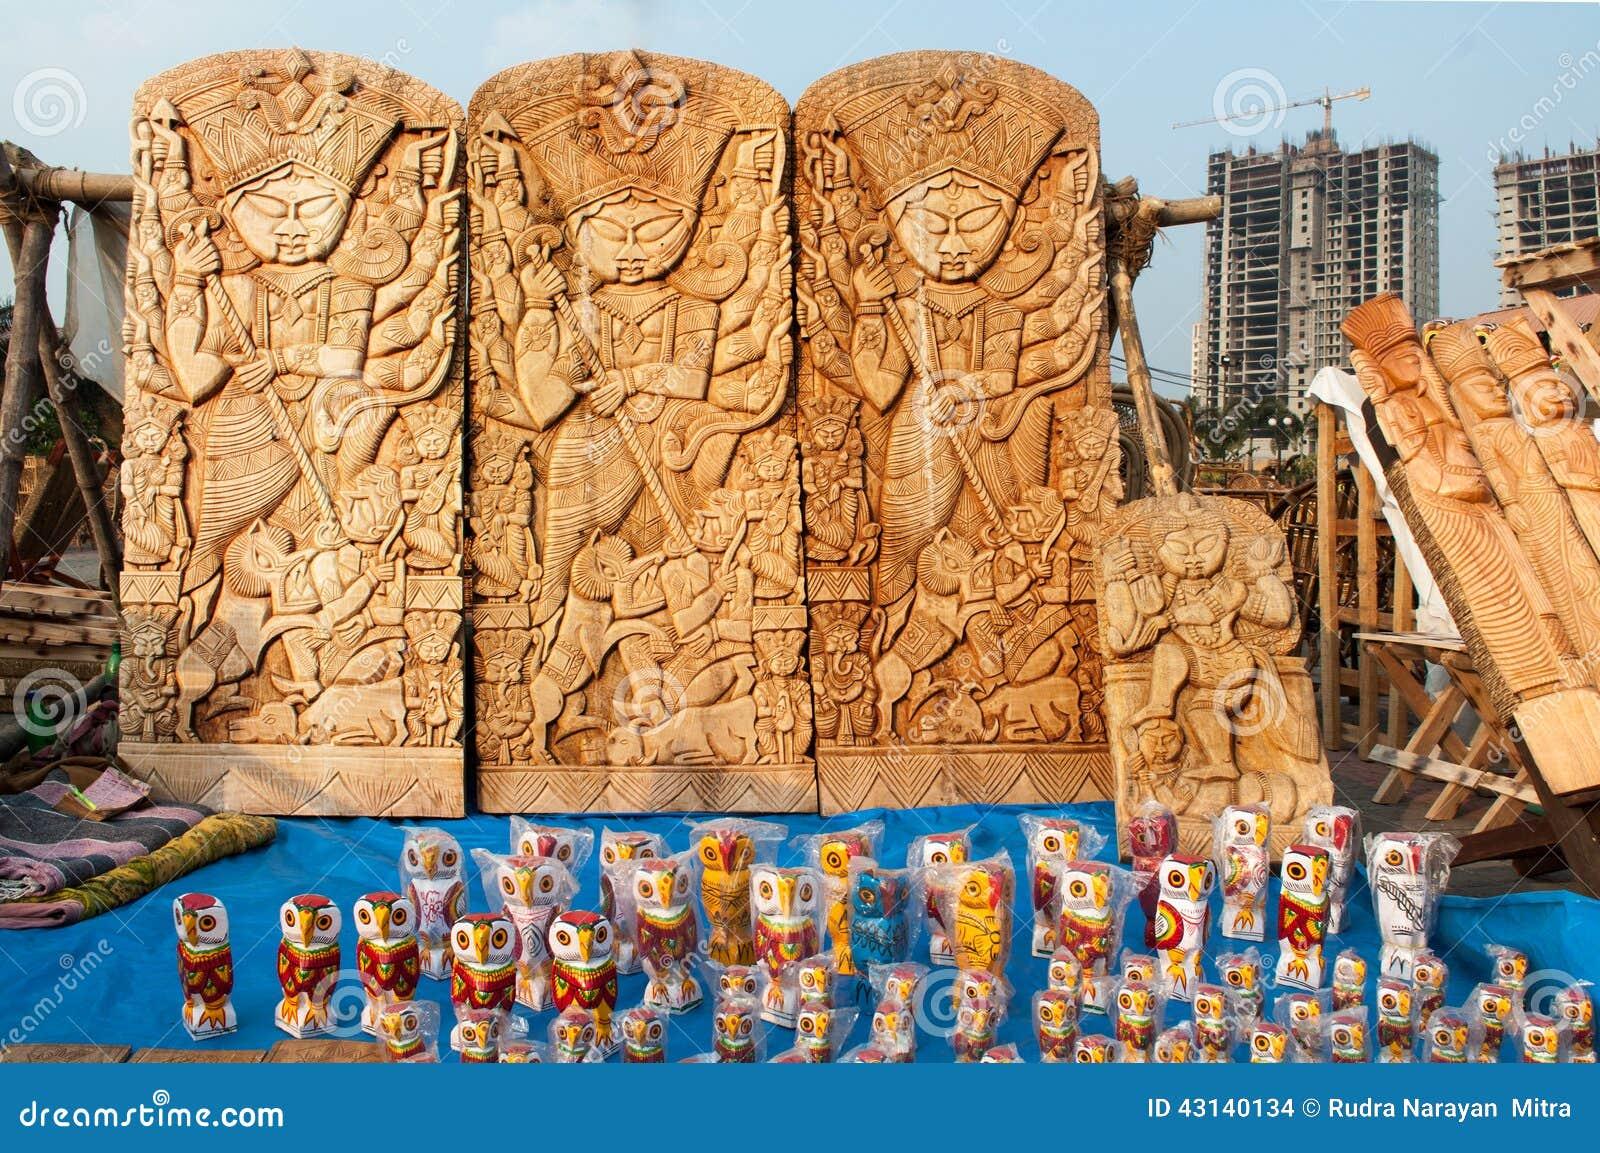 Durga Idol Art Work Indian Handicrafts Fair At Kolkata Editorial